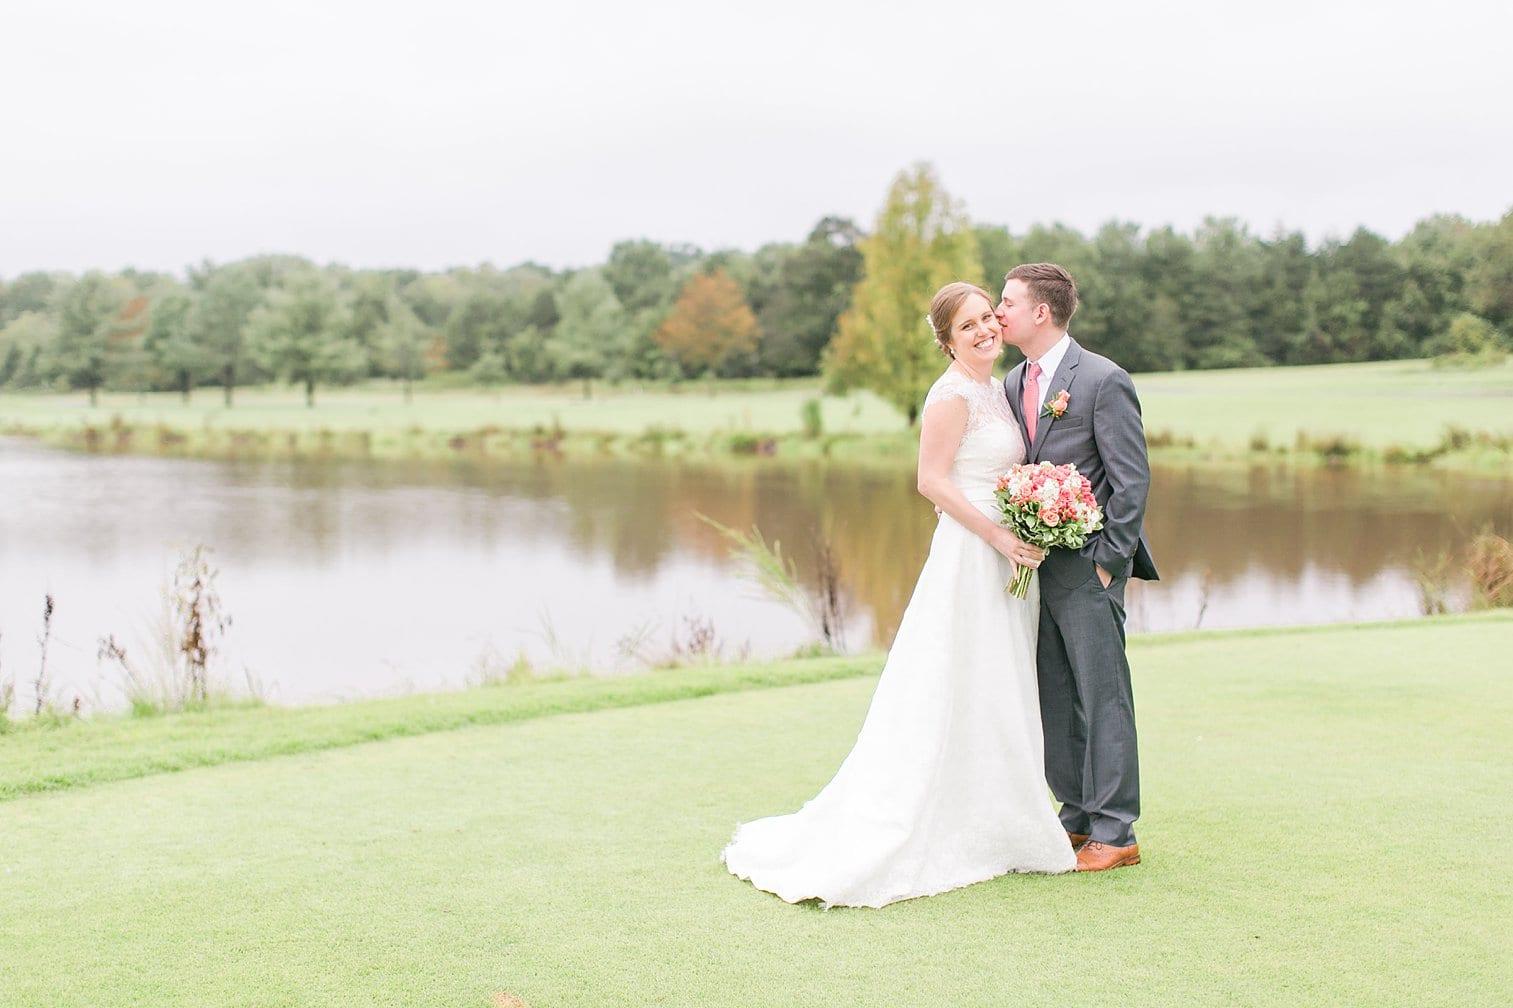 Chantilly National Country Club Wedding Vienna Virginia